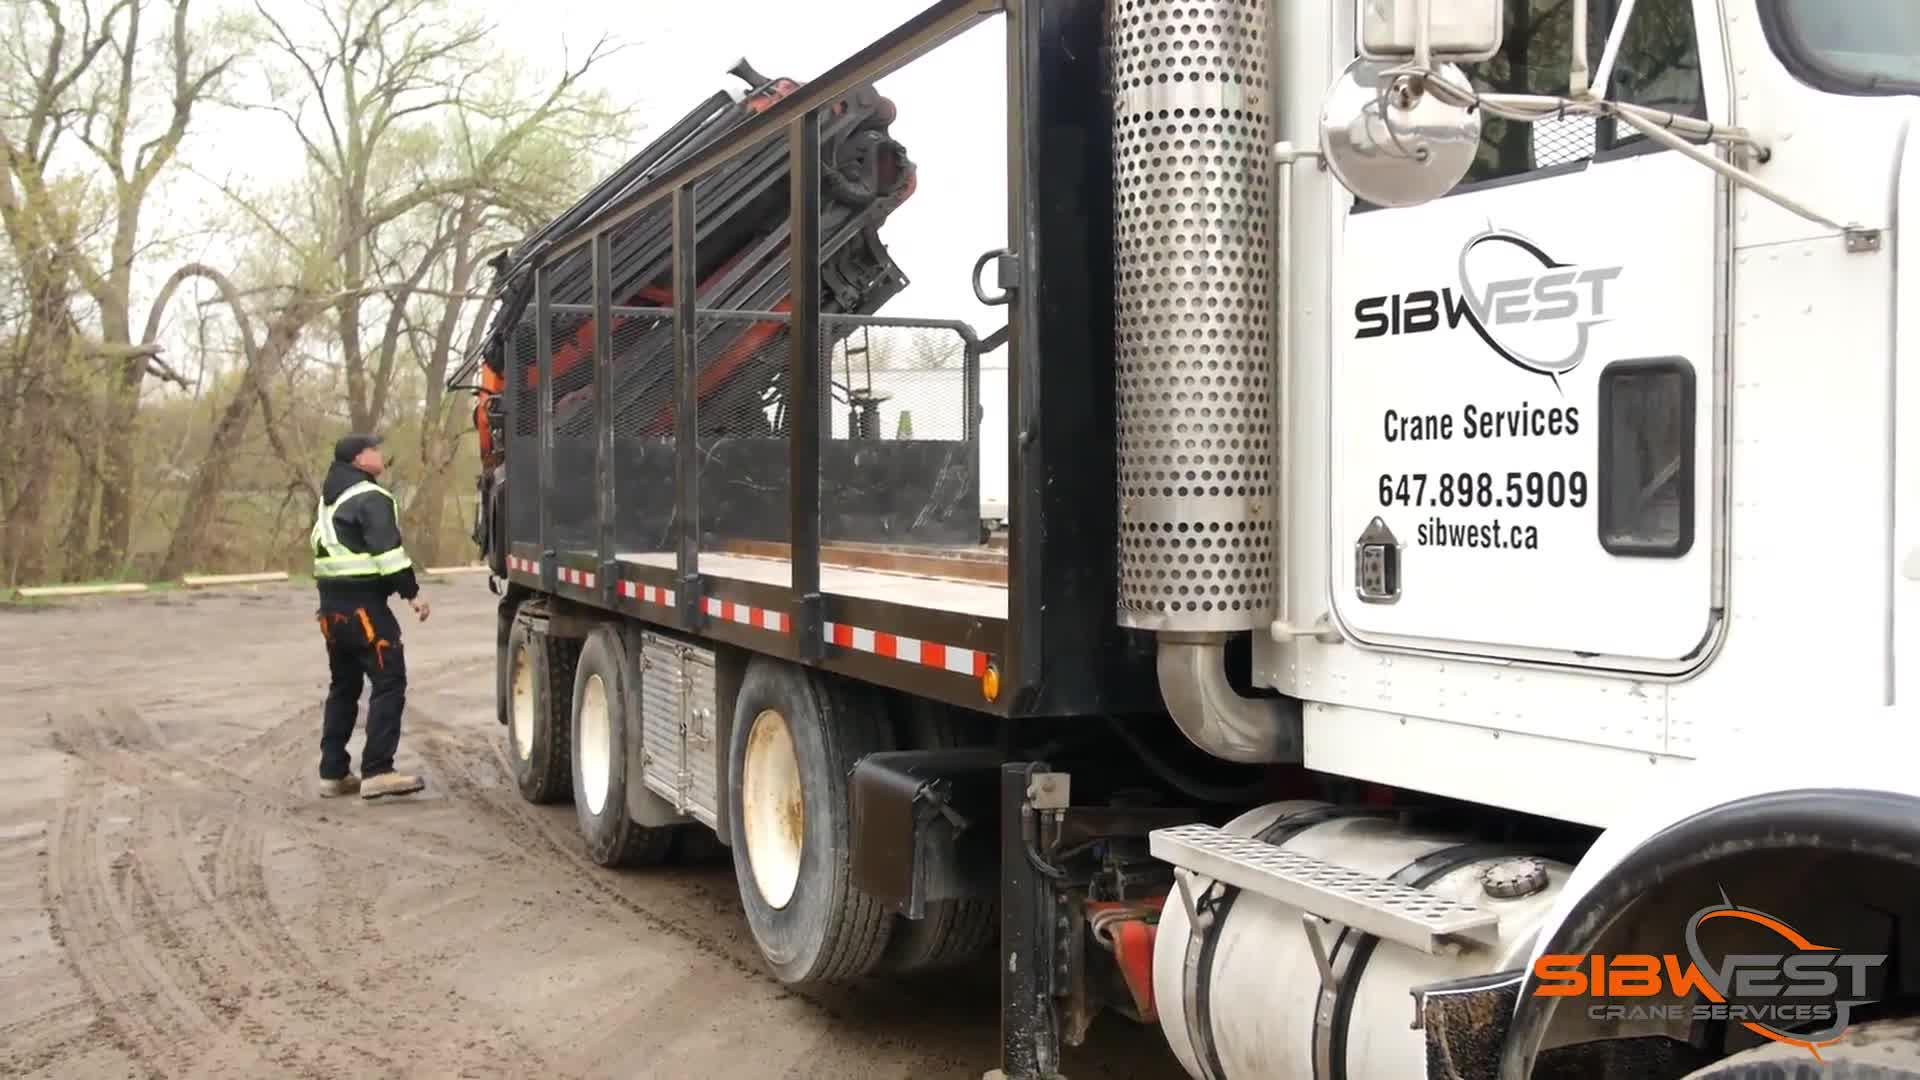 Sibwest Crane Services - Crane Rental & Service - 6478985909